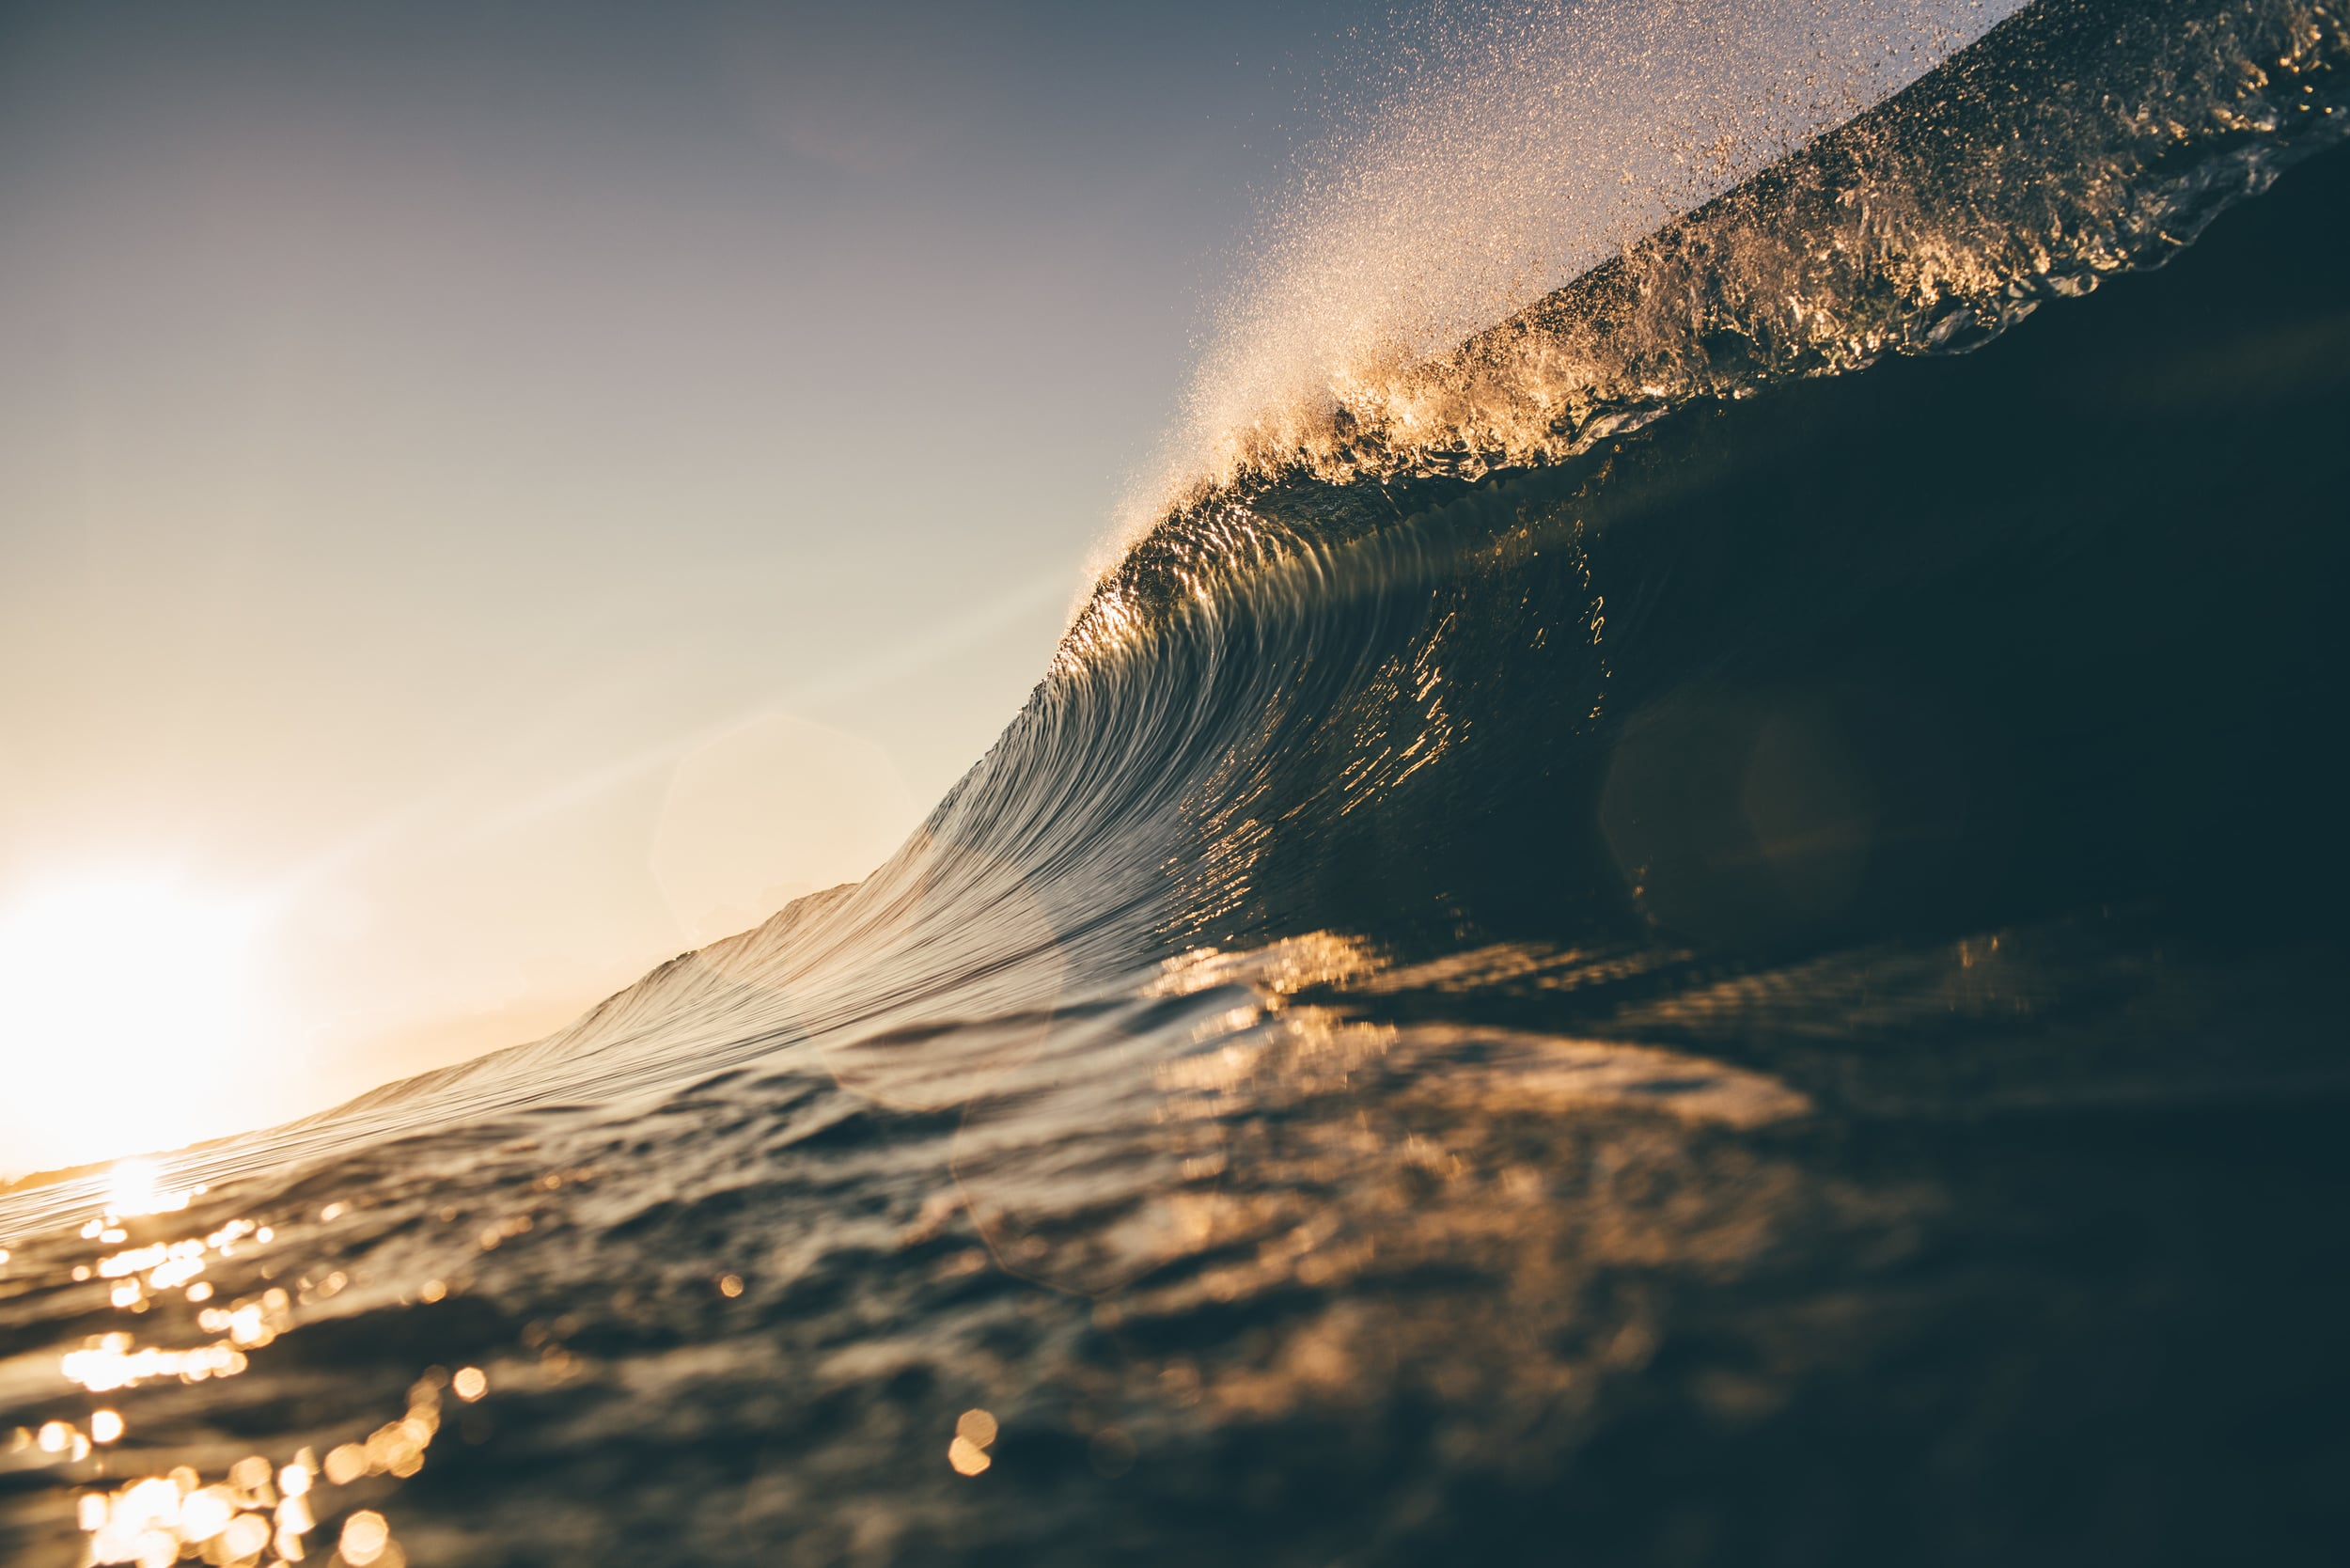 bryce-johnson-photography-kauai-hawaii-surfing-a7rii-aquatech-water-ocean-19.jpg